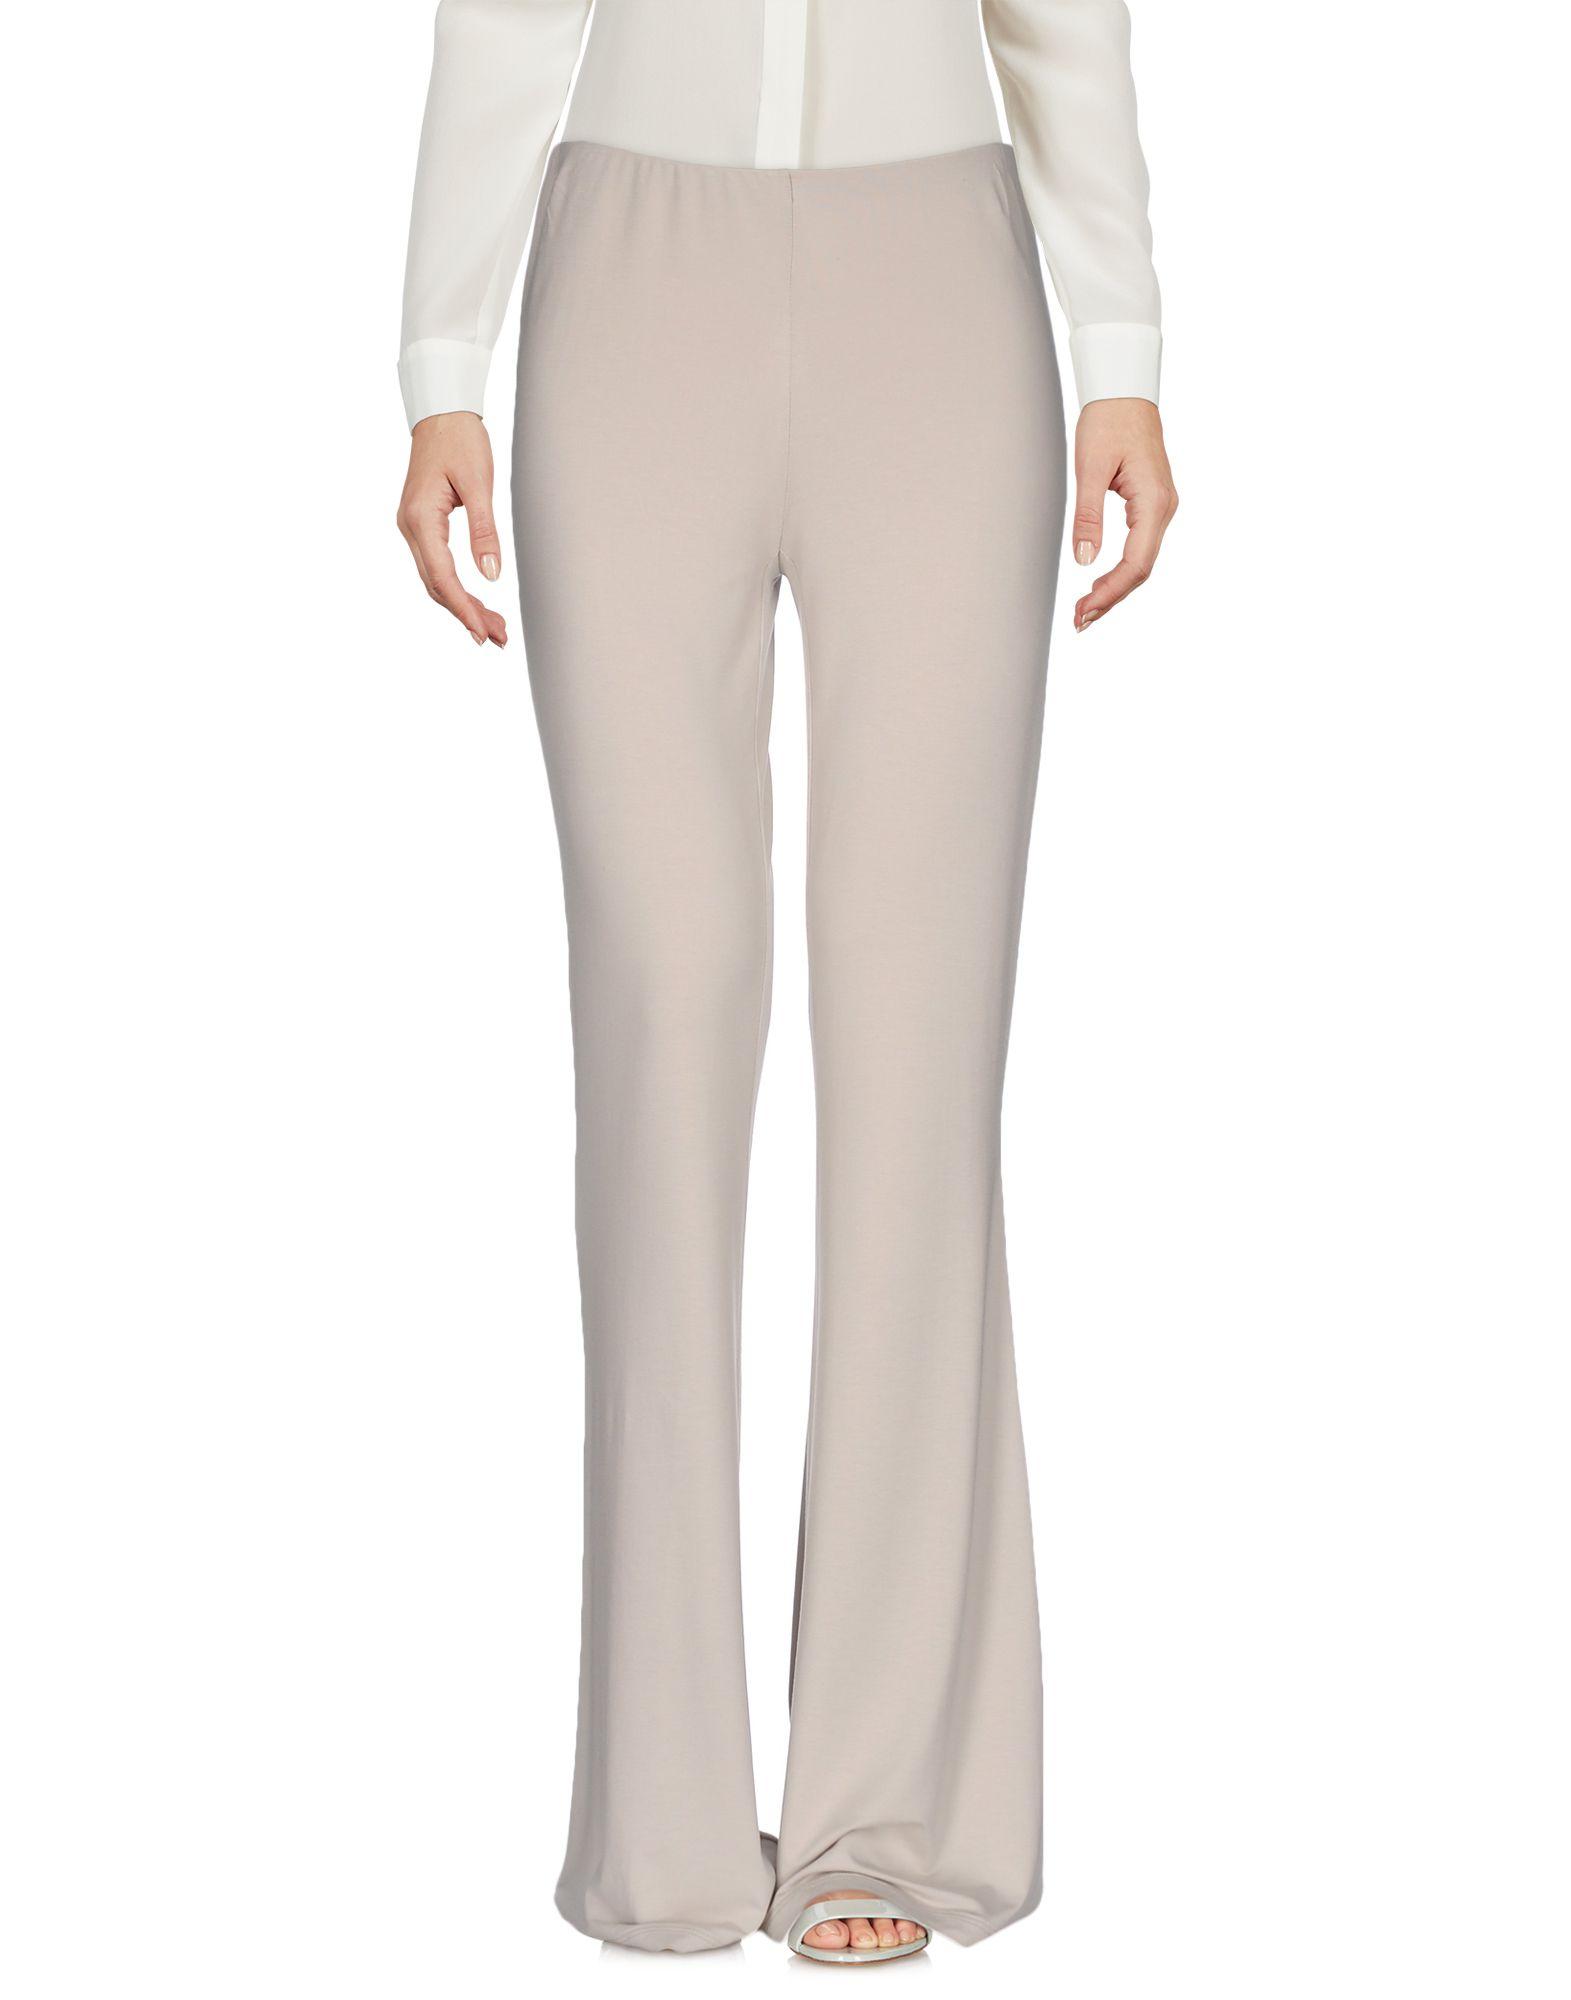 D.EXTERIOR Damen Hose Farbe Grau Größe 3 - broschei